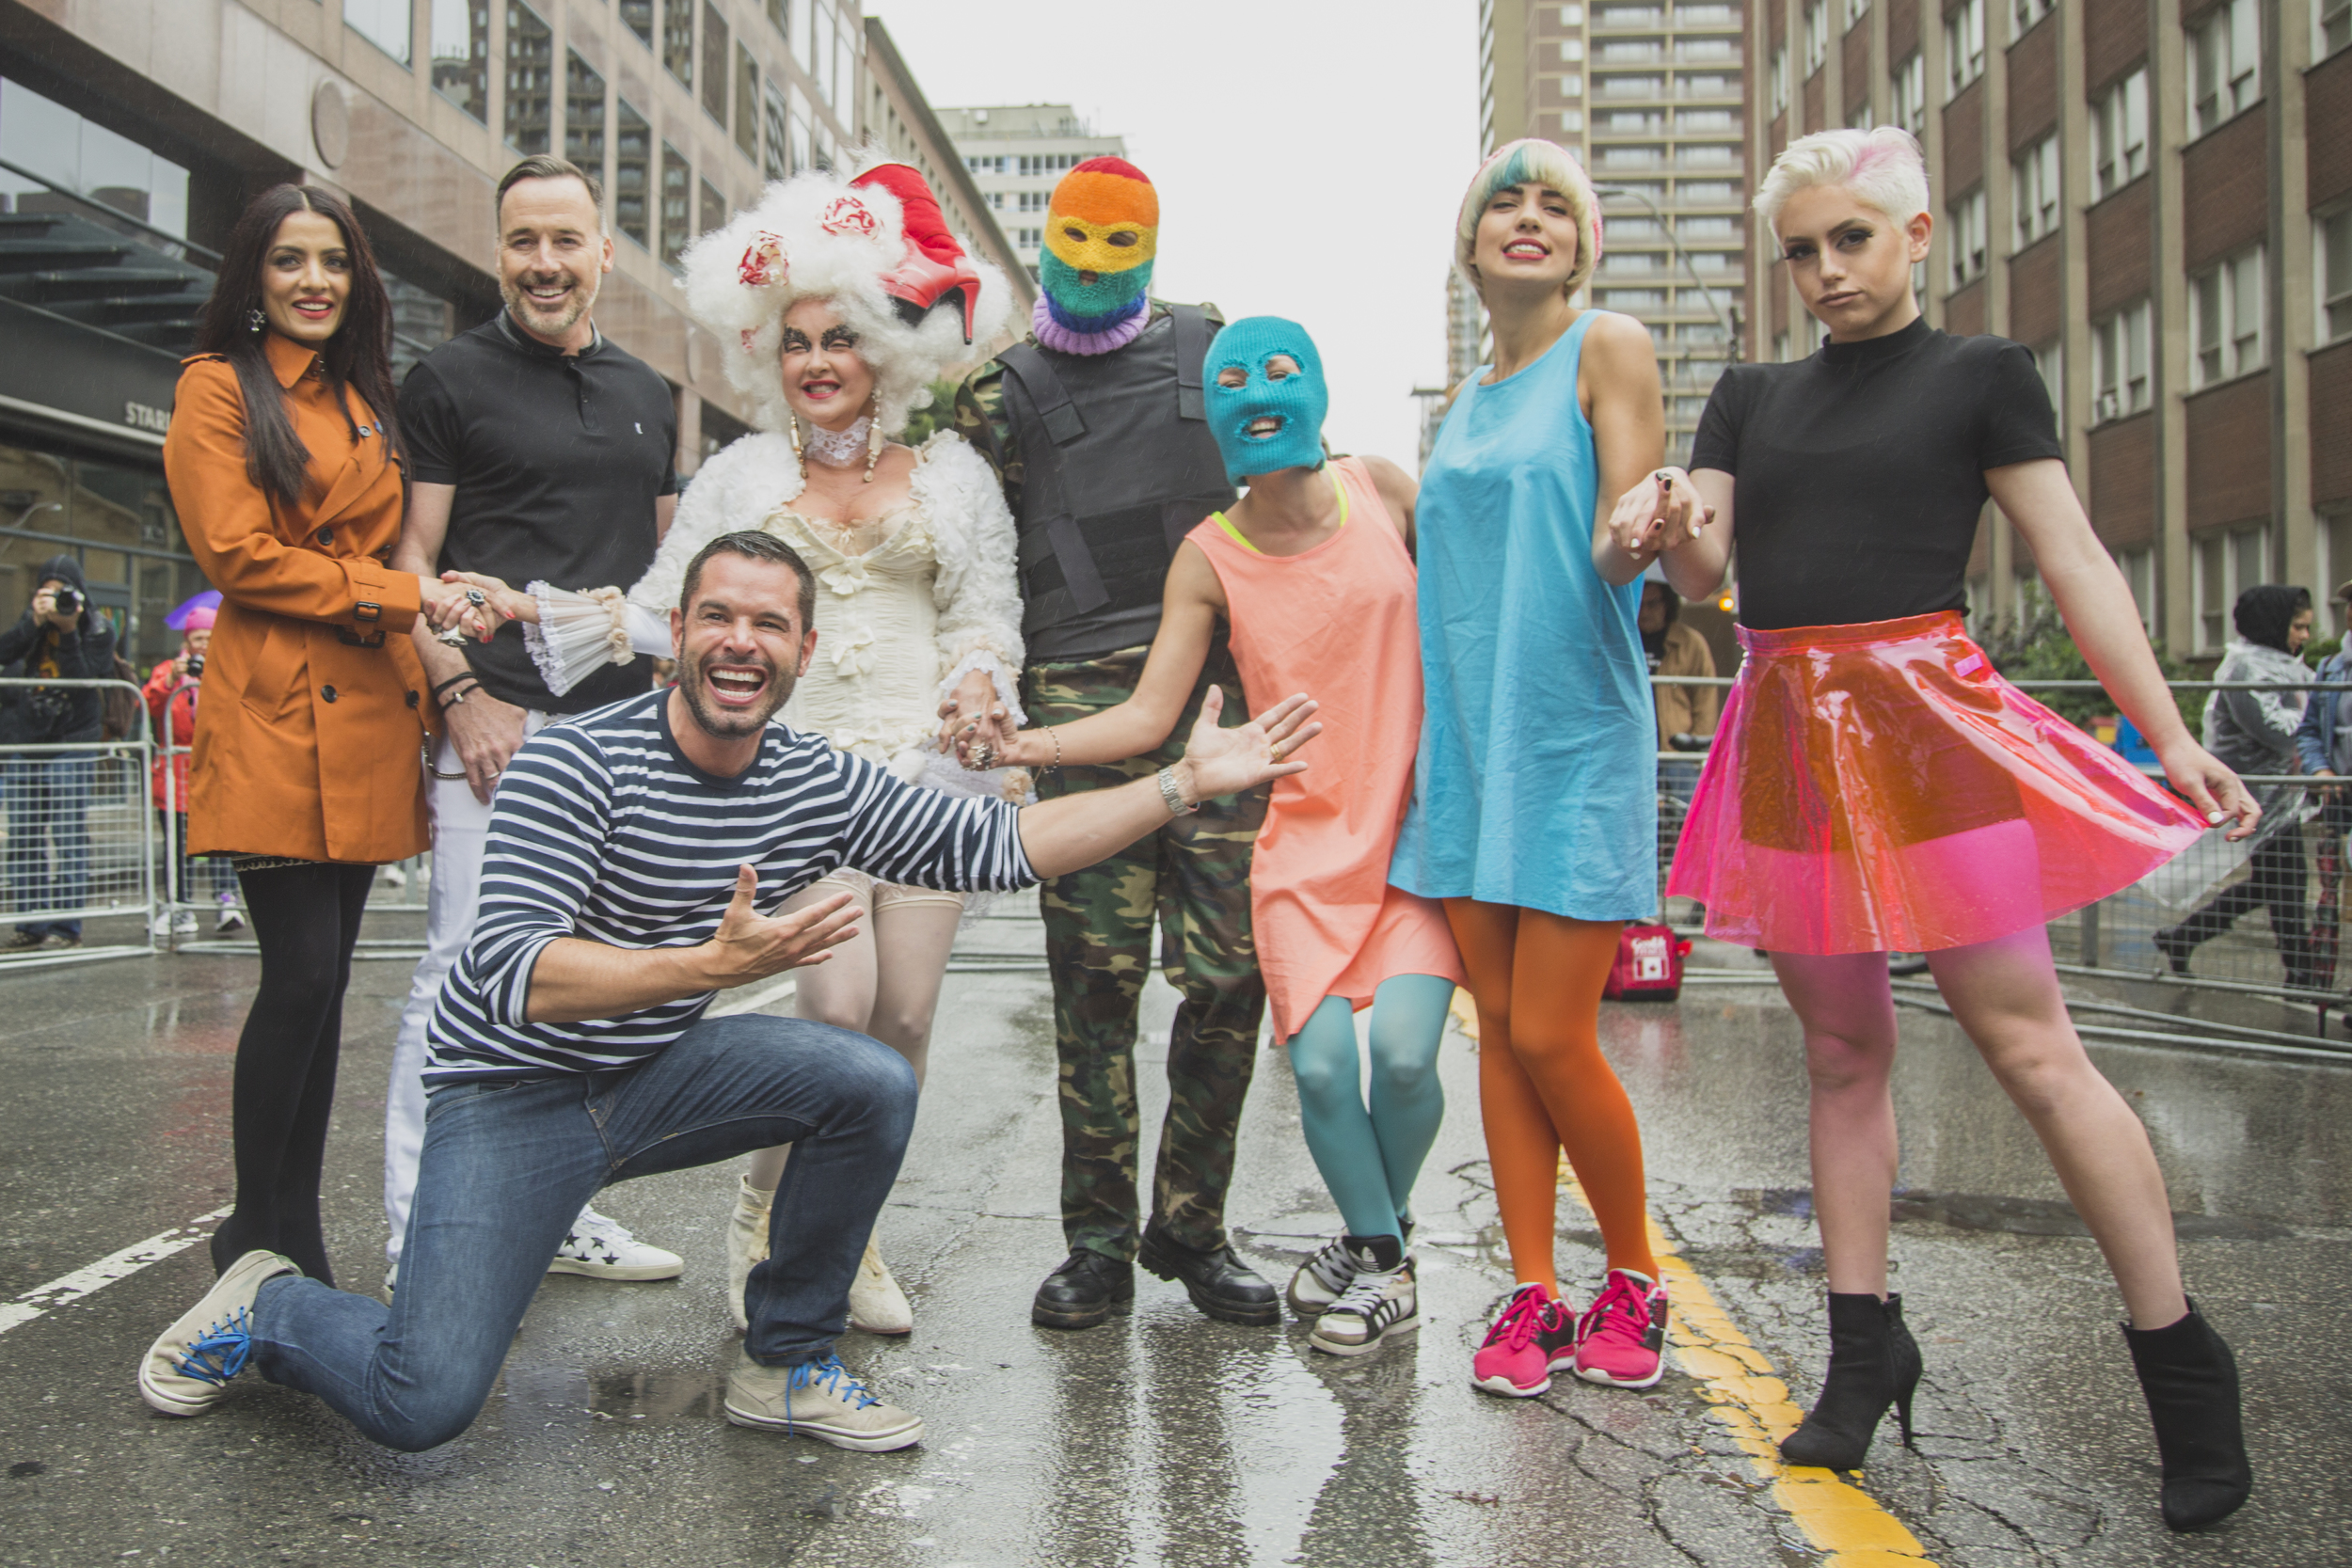 Pride_Toronto_2015_Pride_Parade_by_Indeana_Underhill-23.jpg